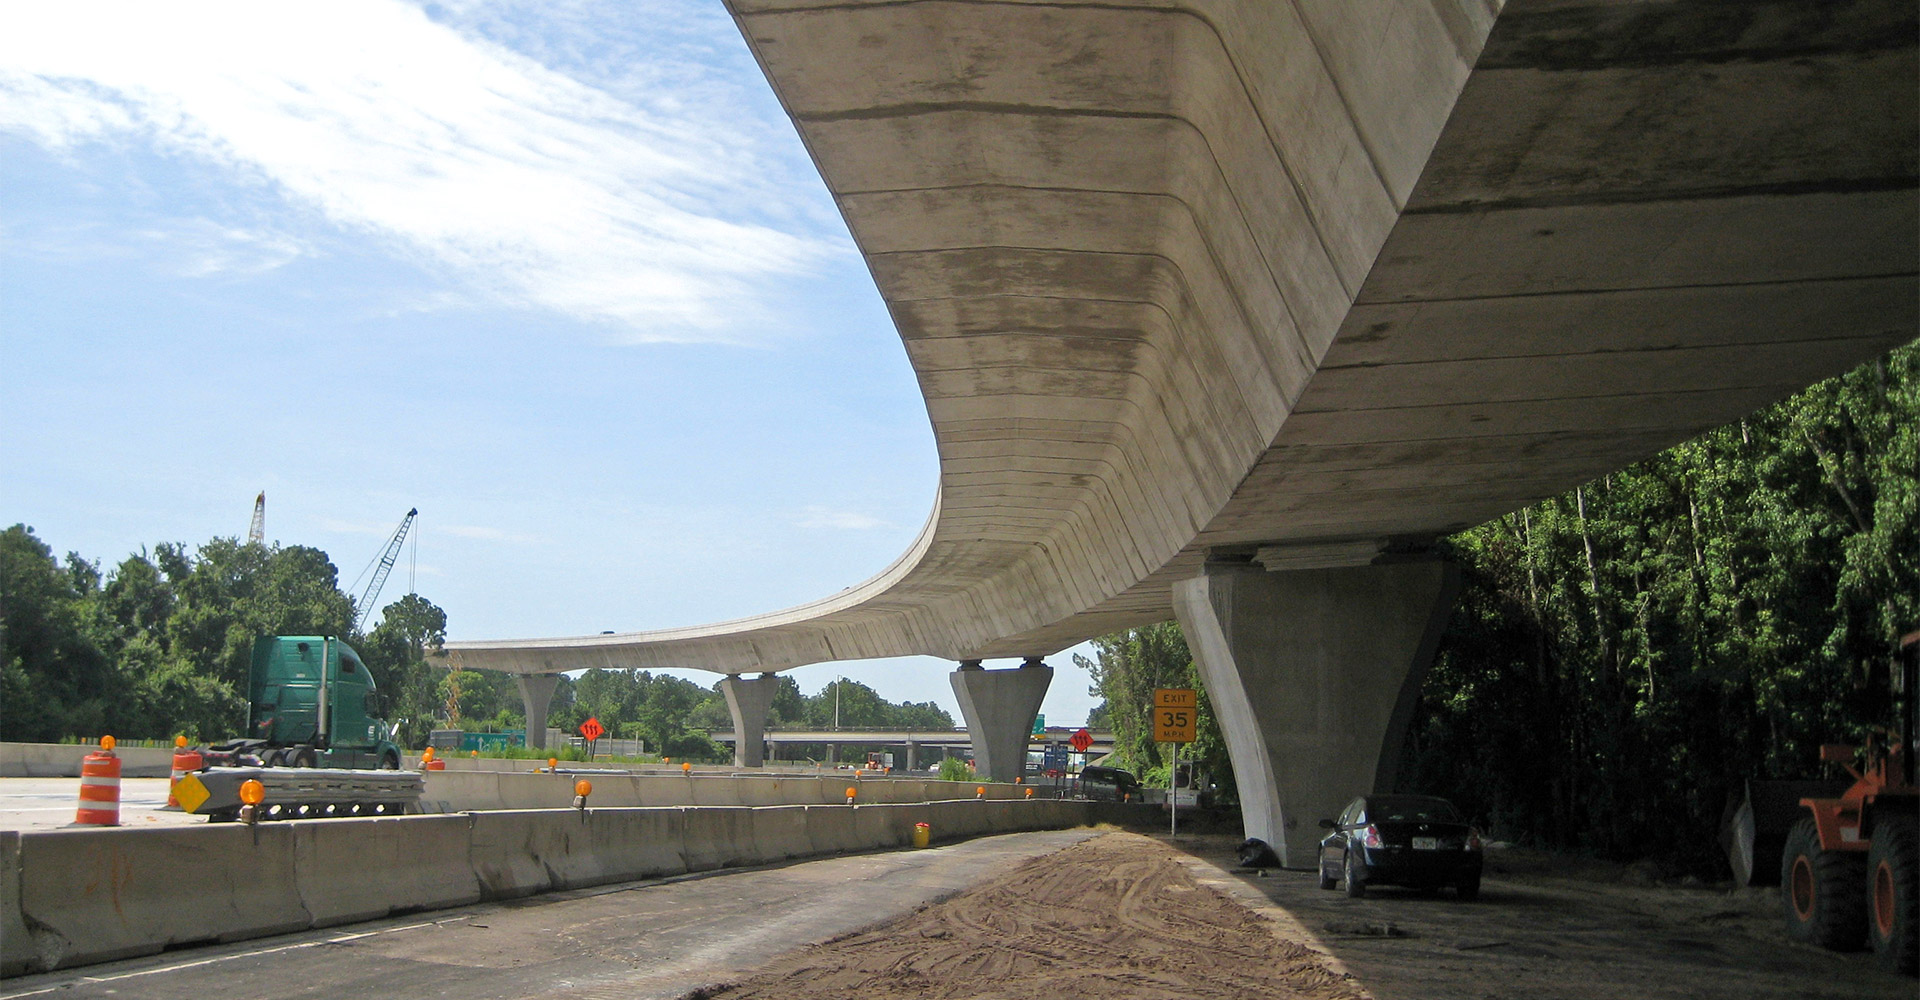 Construction on I-295 - I-95 - SR9A North Interchange.